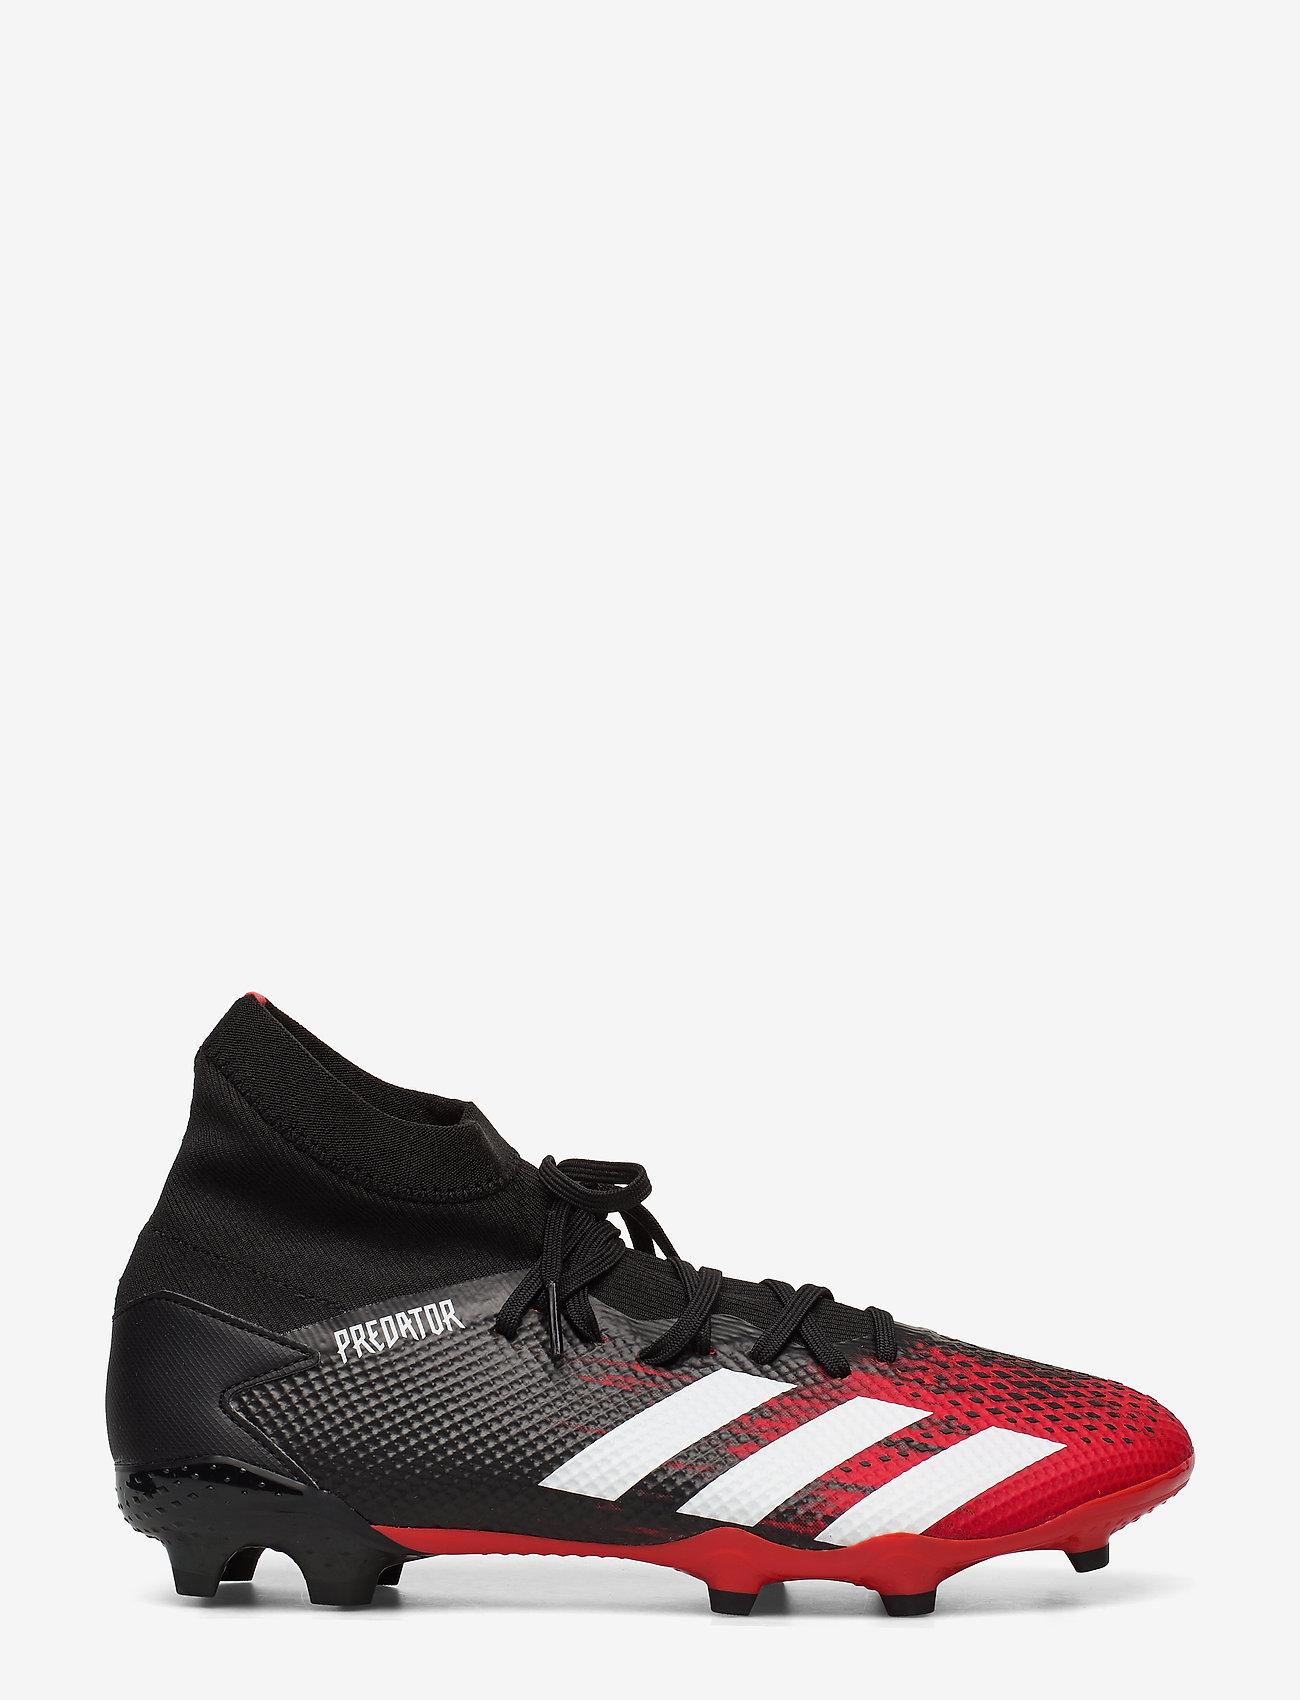 adidas Performance - PREDATOR 20.3 FG - fodboldsko - cblack/ftwwht/actred - 1